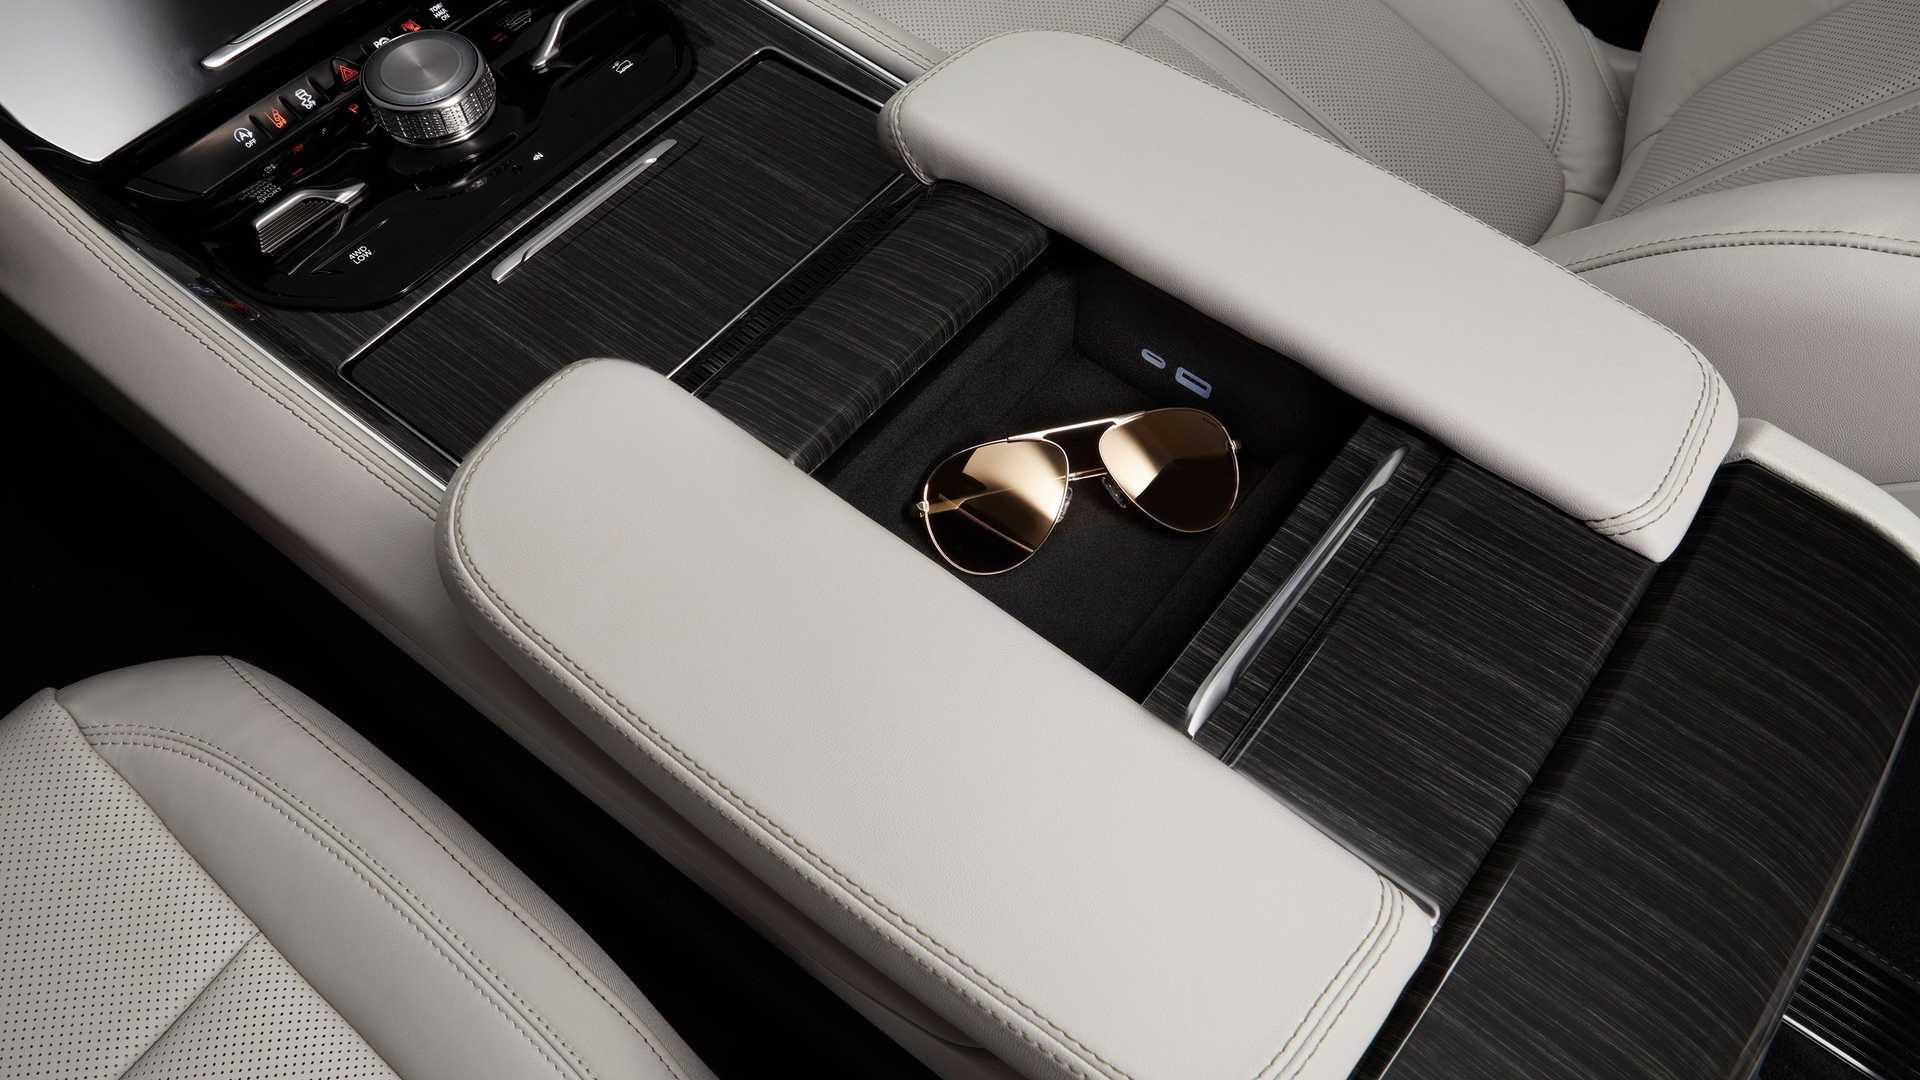 2022-jeep-wagoneer-interior-armrest-storage-1